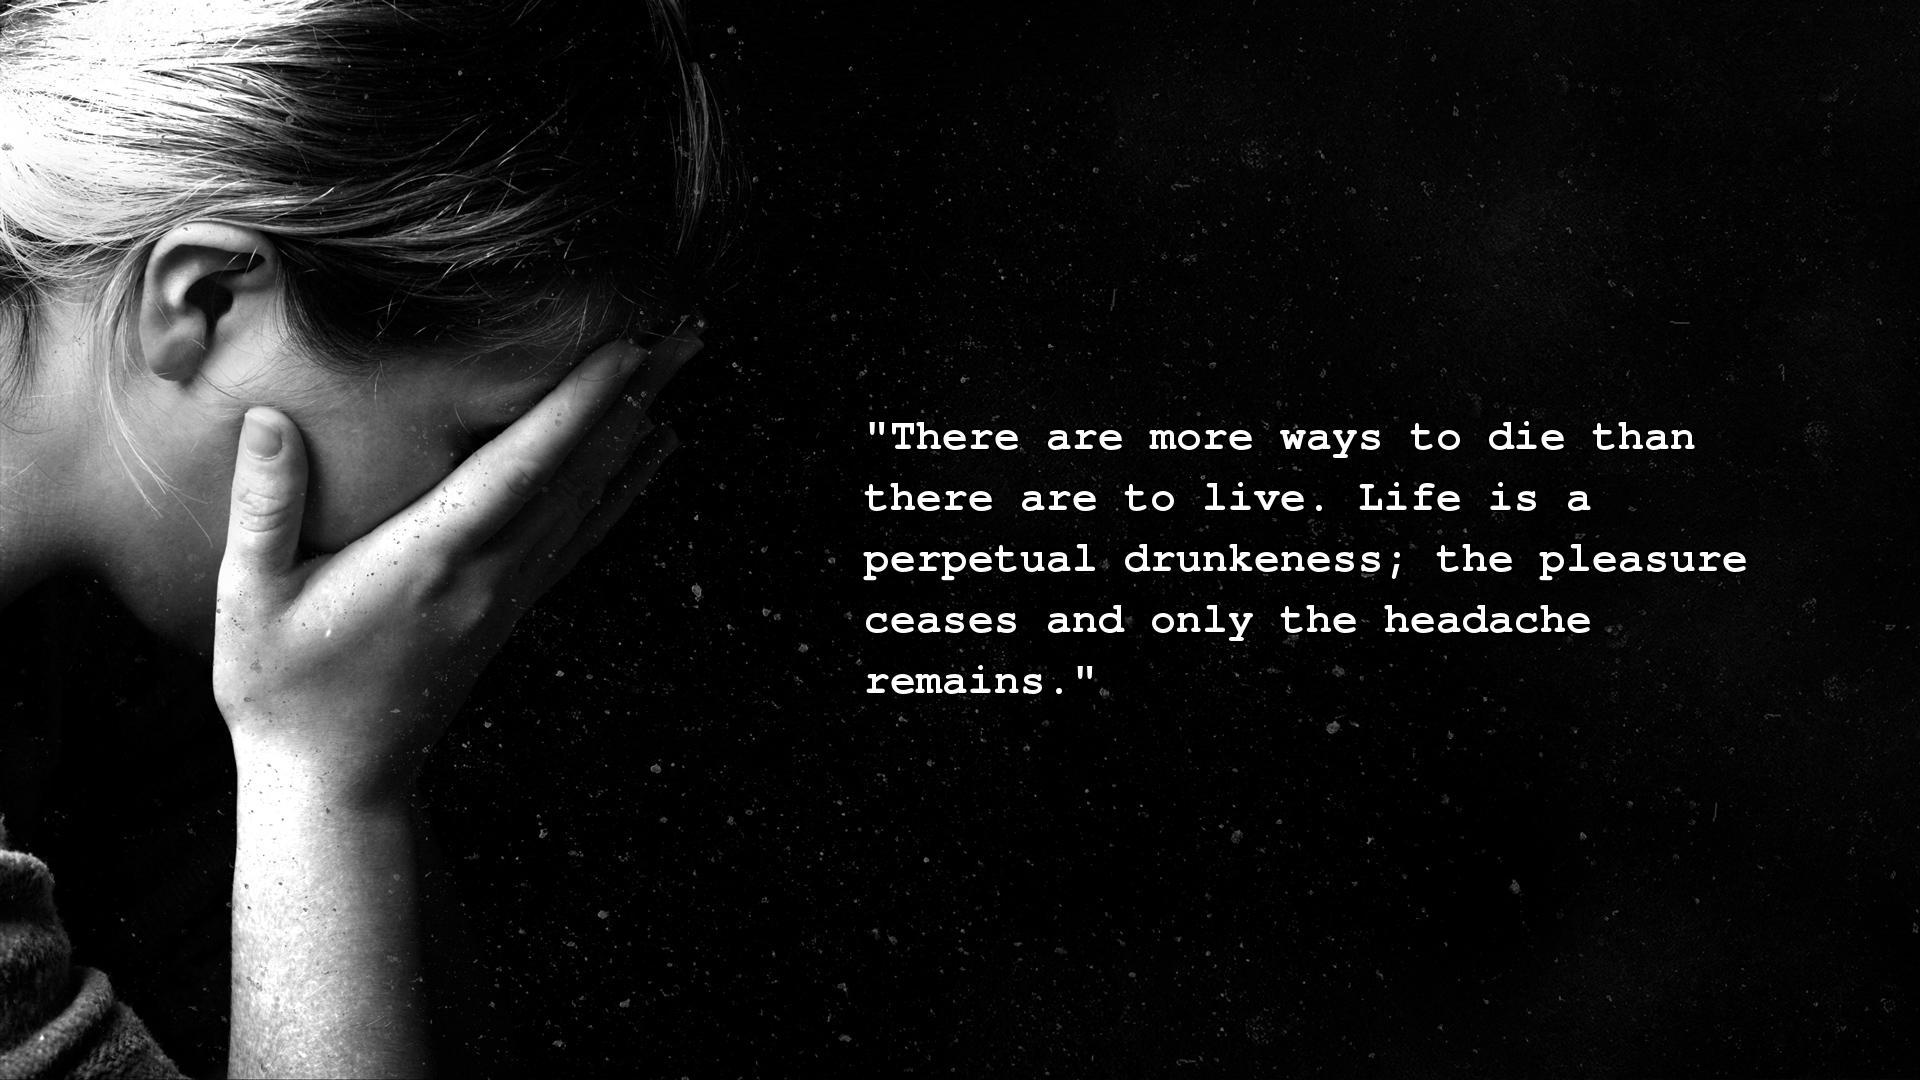 Depressed? Find Great Depression Quotes Wallpaper Online